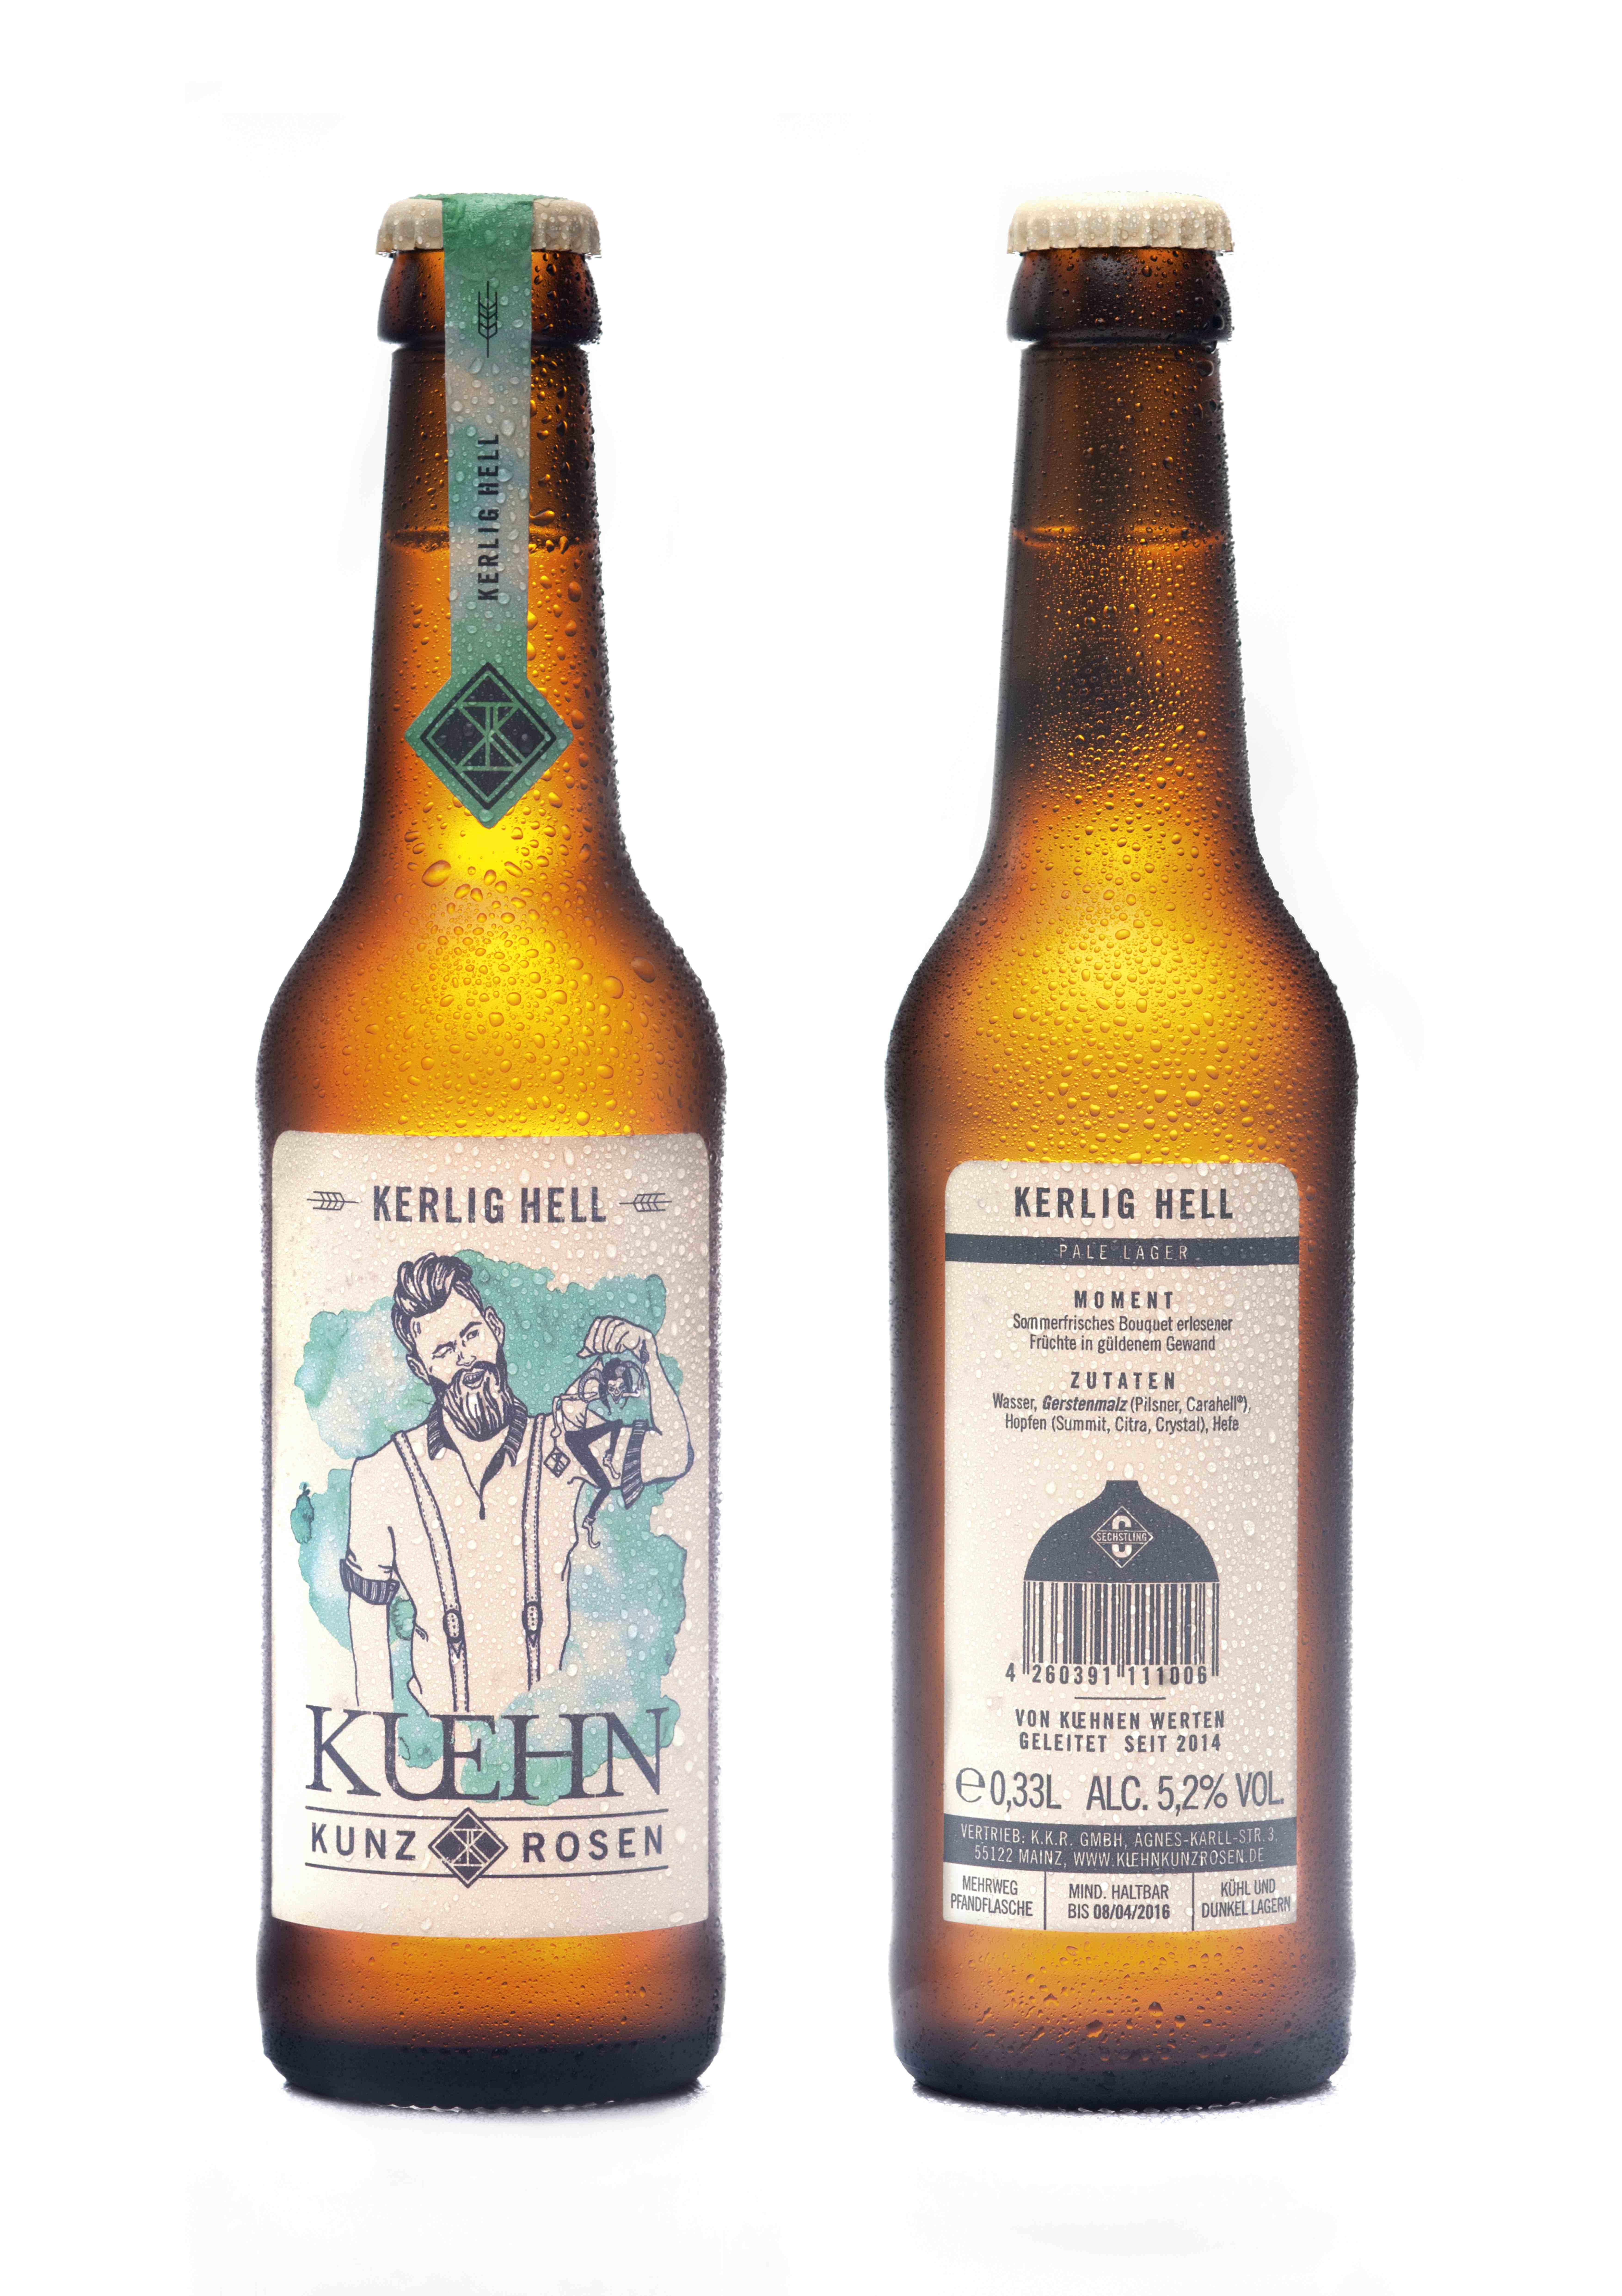 KUEHN KUNZ ROSEN Brauerei Mainz